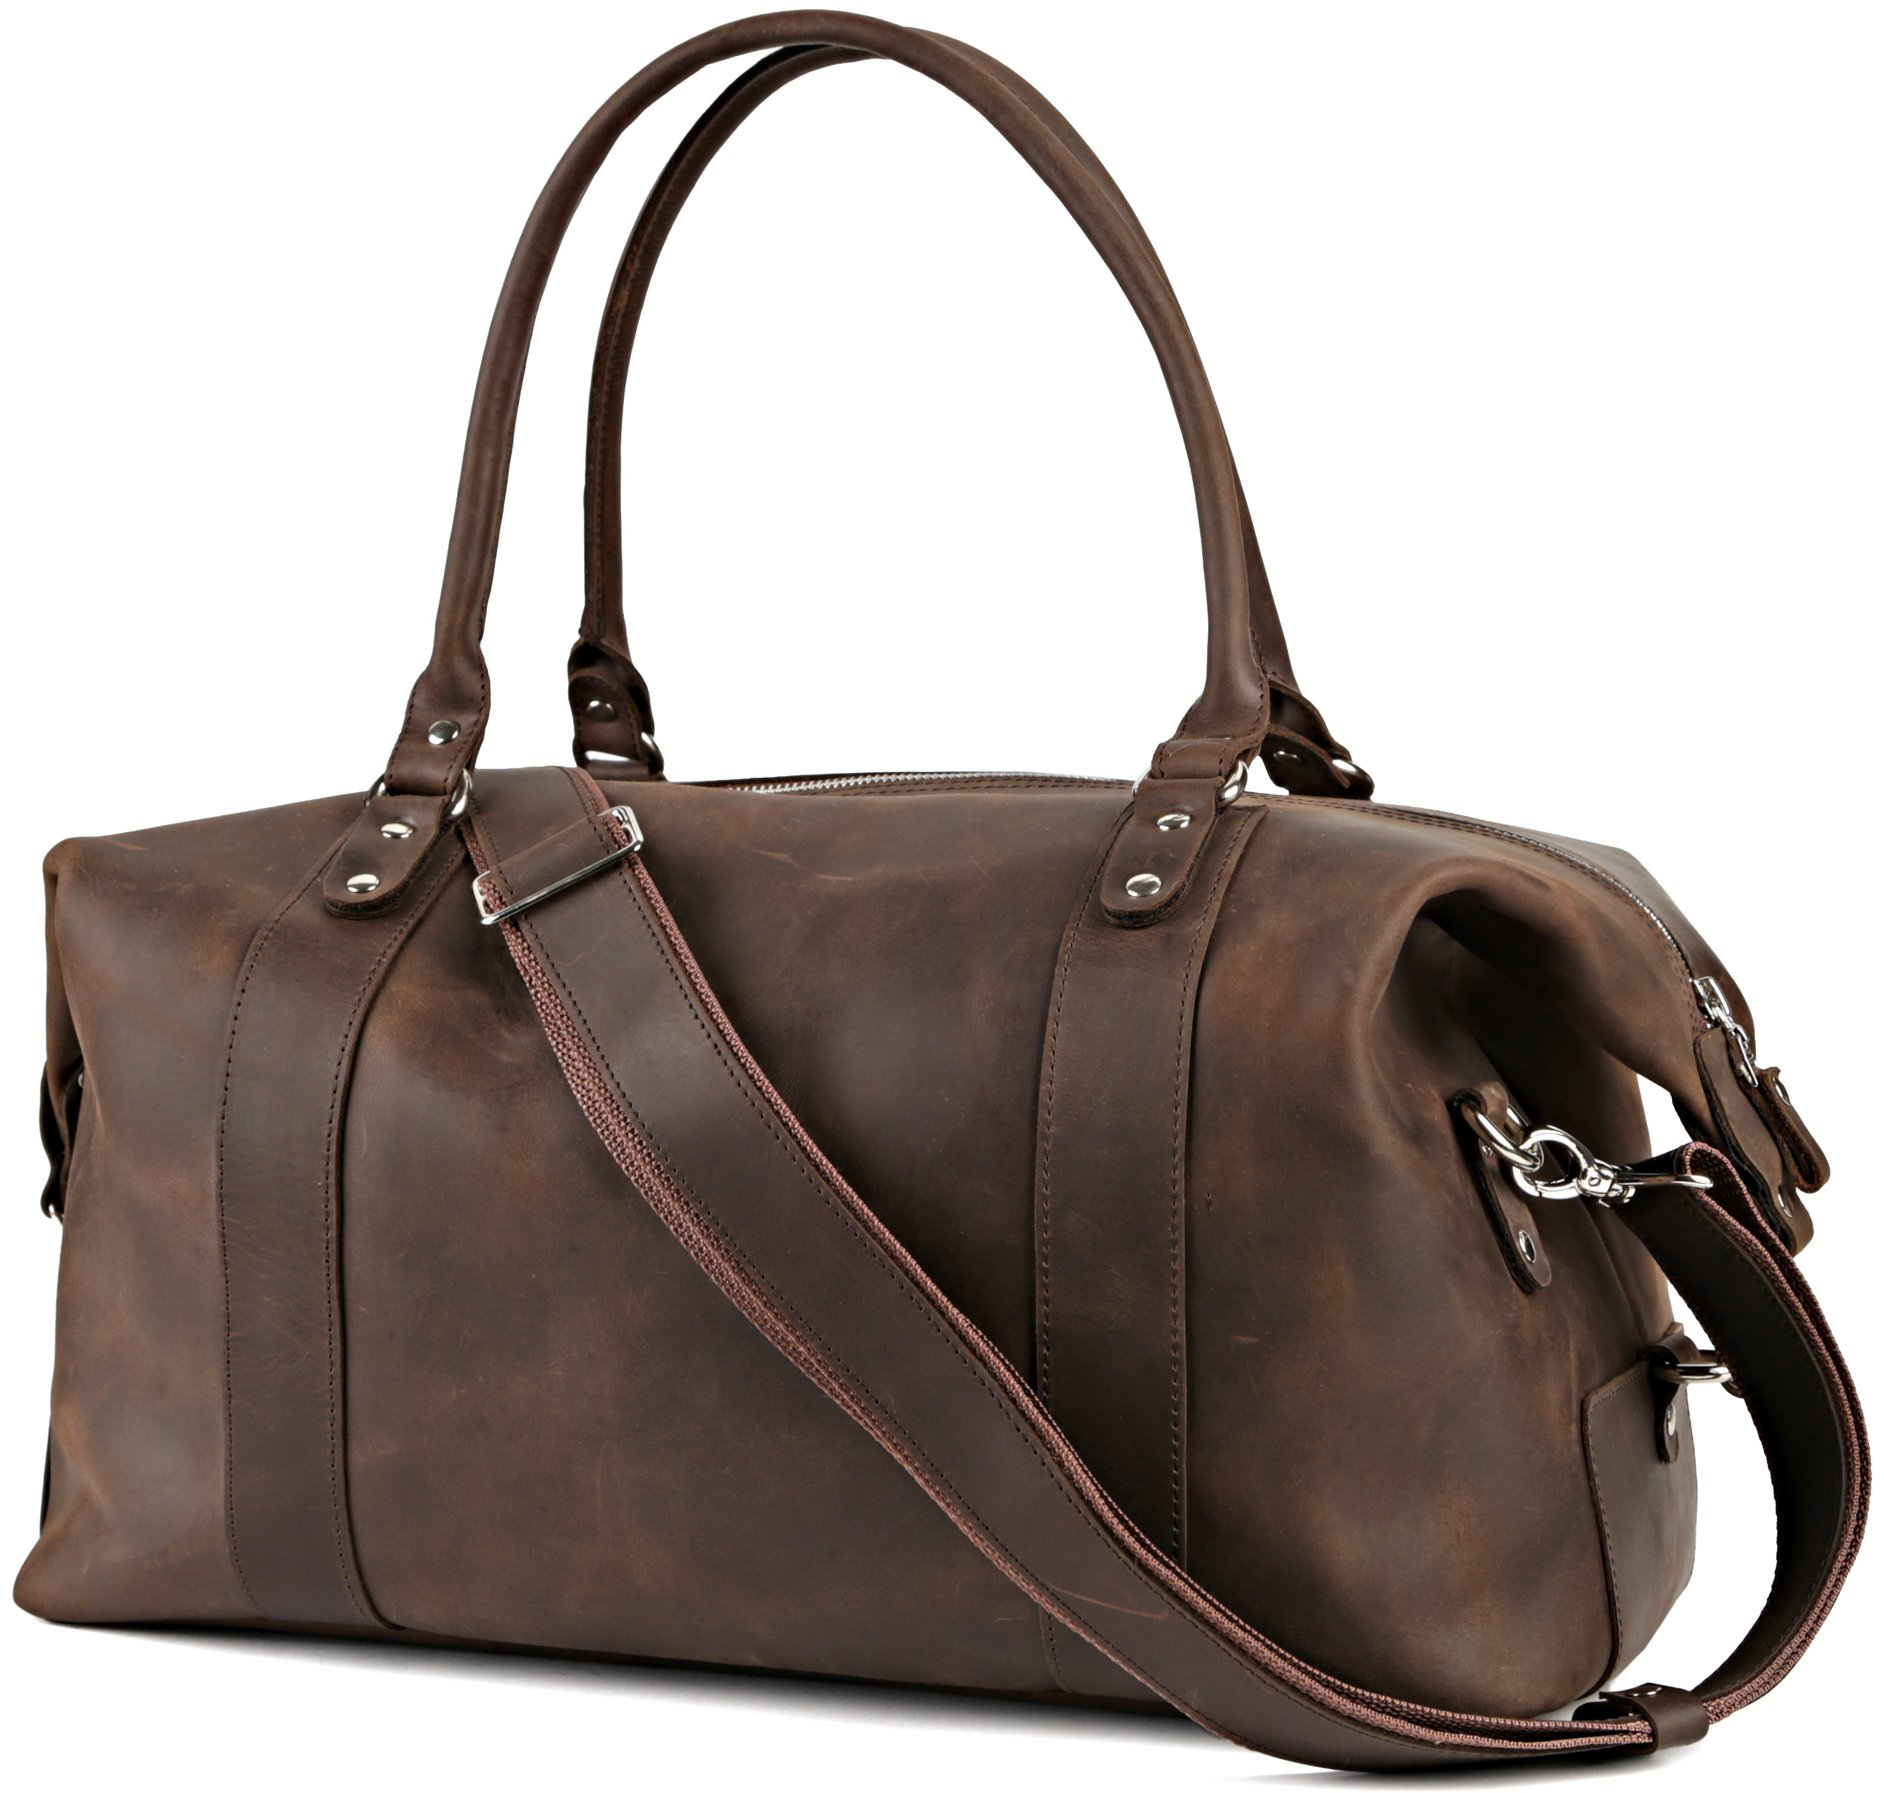 Shvigel Leather Duffel Travel Bag - Sports Gym Bag - Weekend Overnight Luggage Bag - Weekender (Brown Vintage)